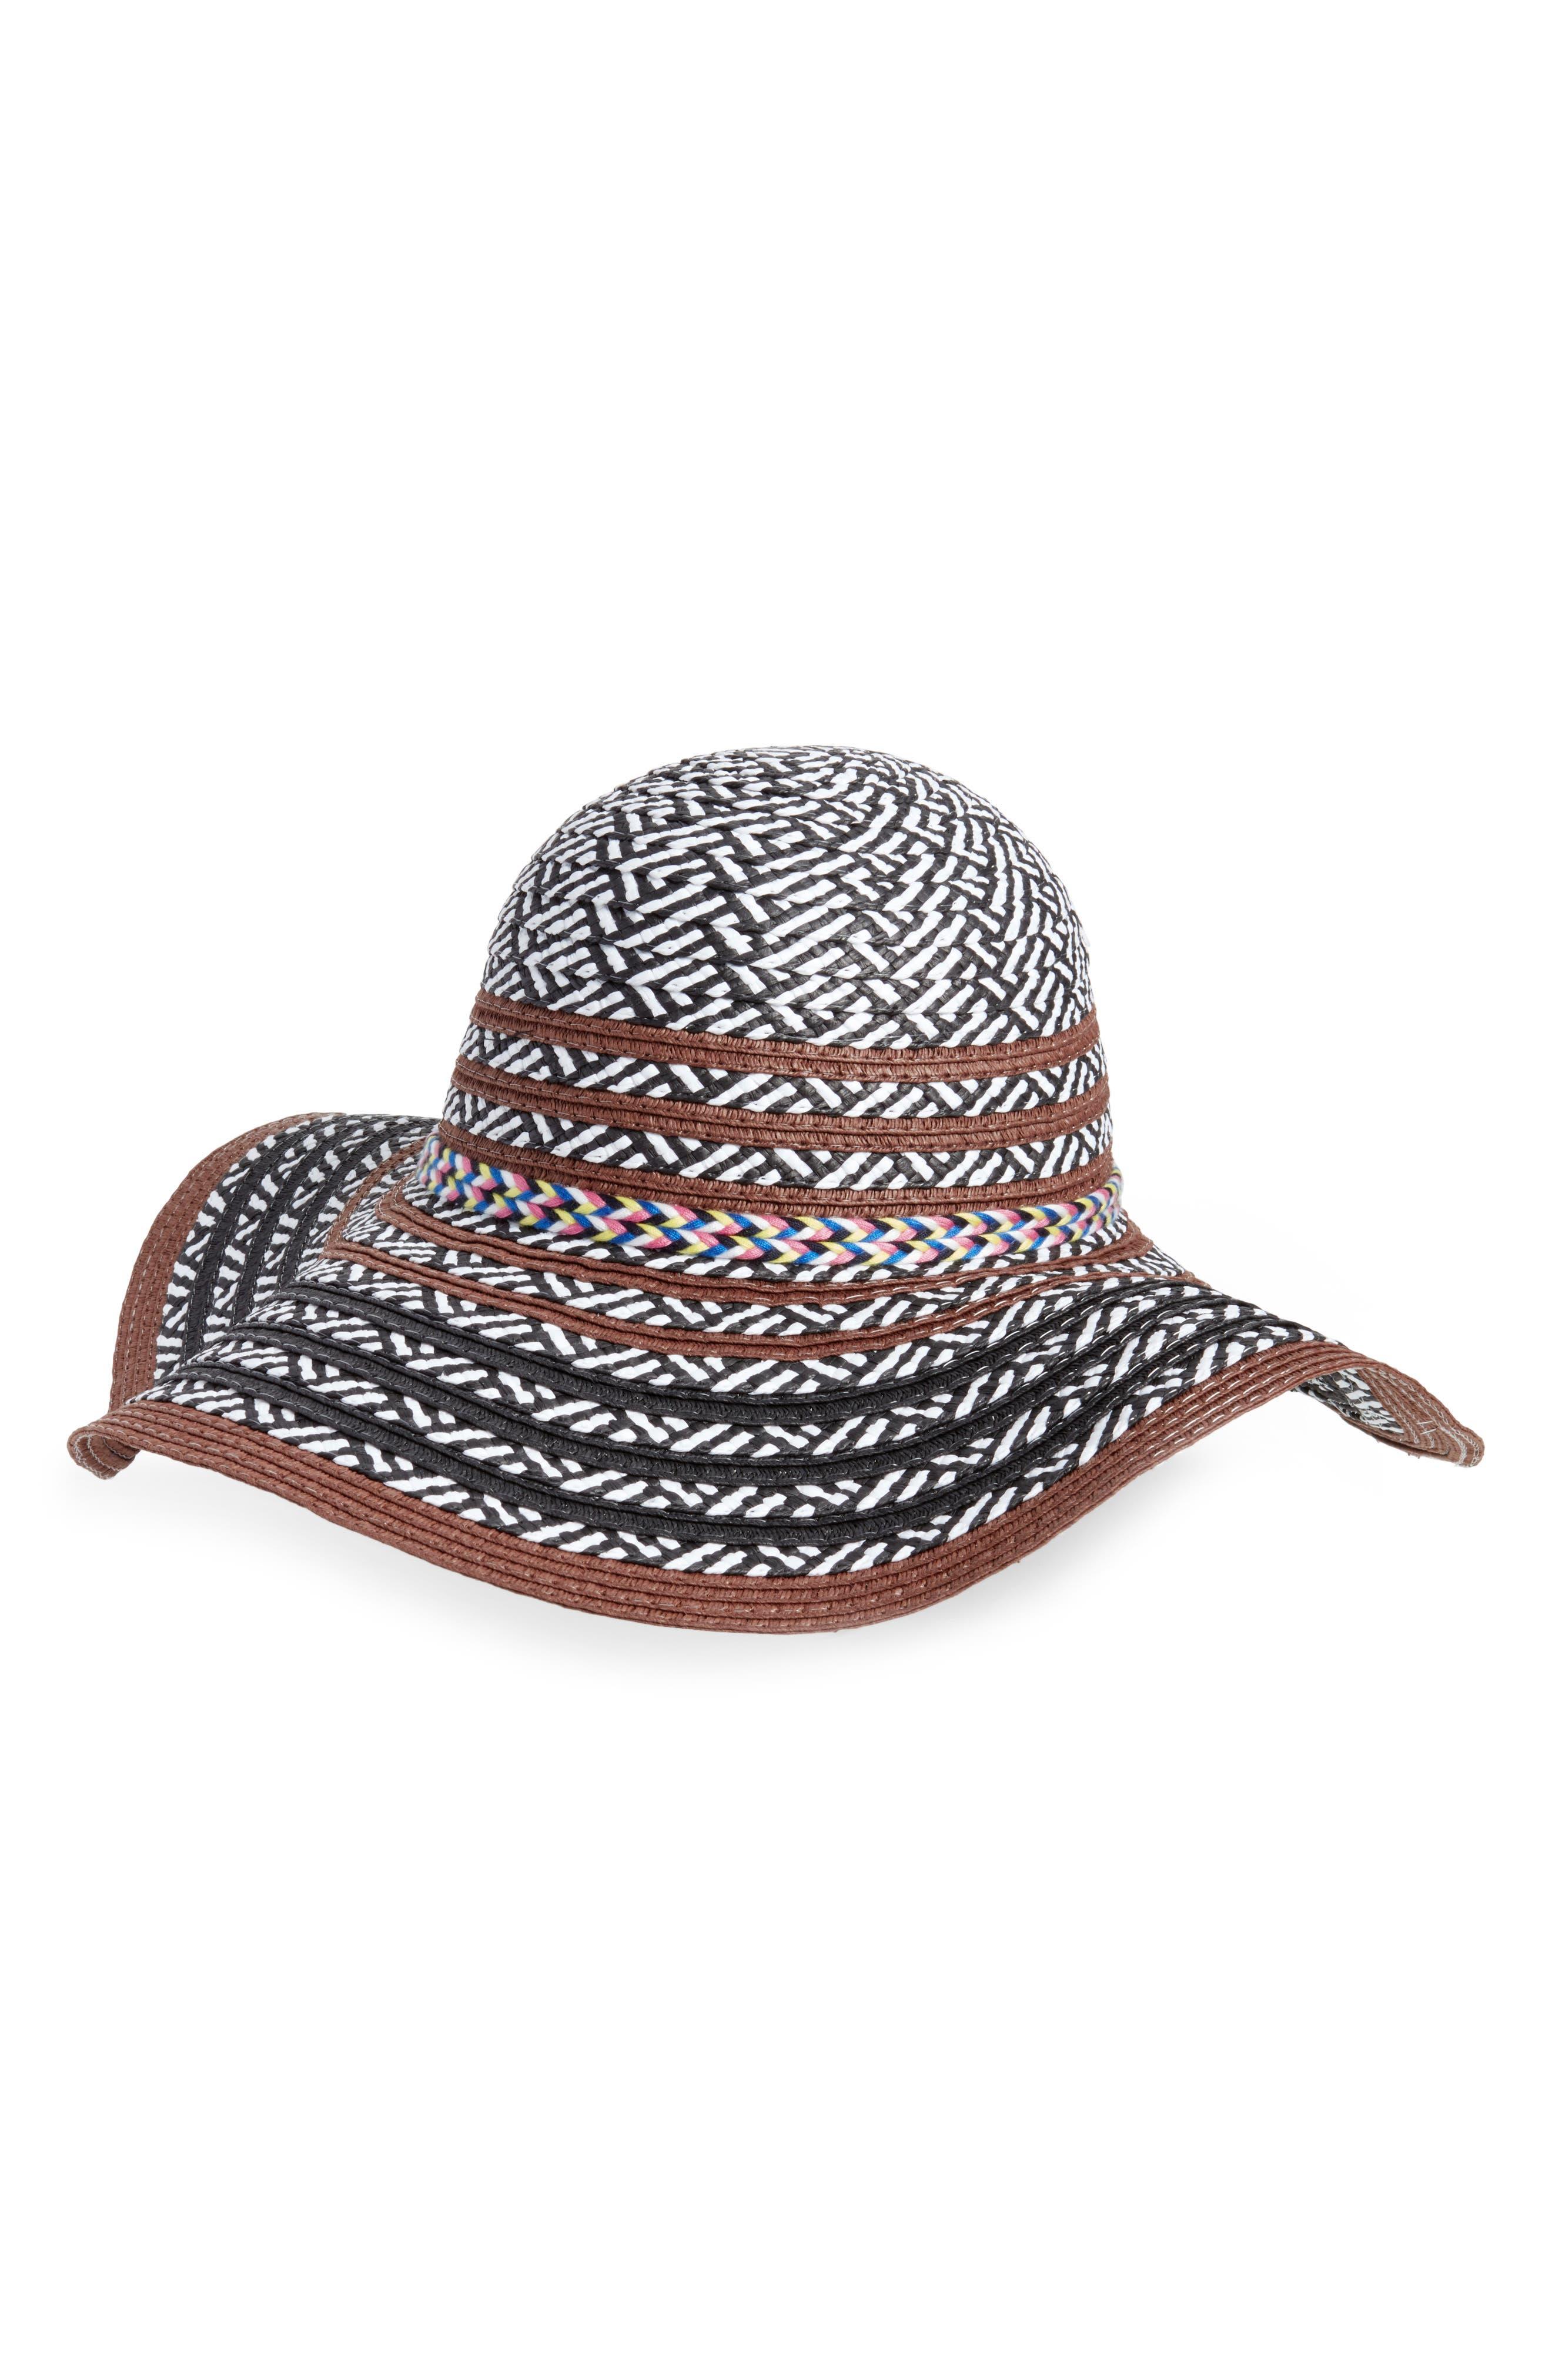 Beach Party Floppy Hat,                         Main,                         color,